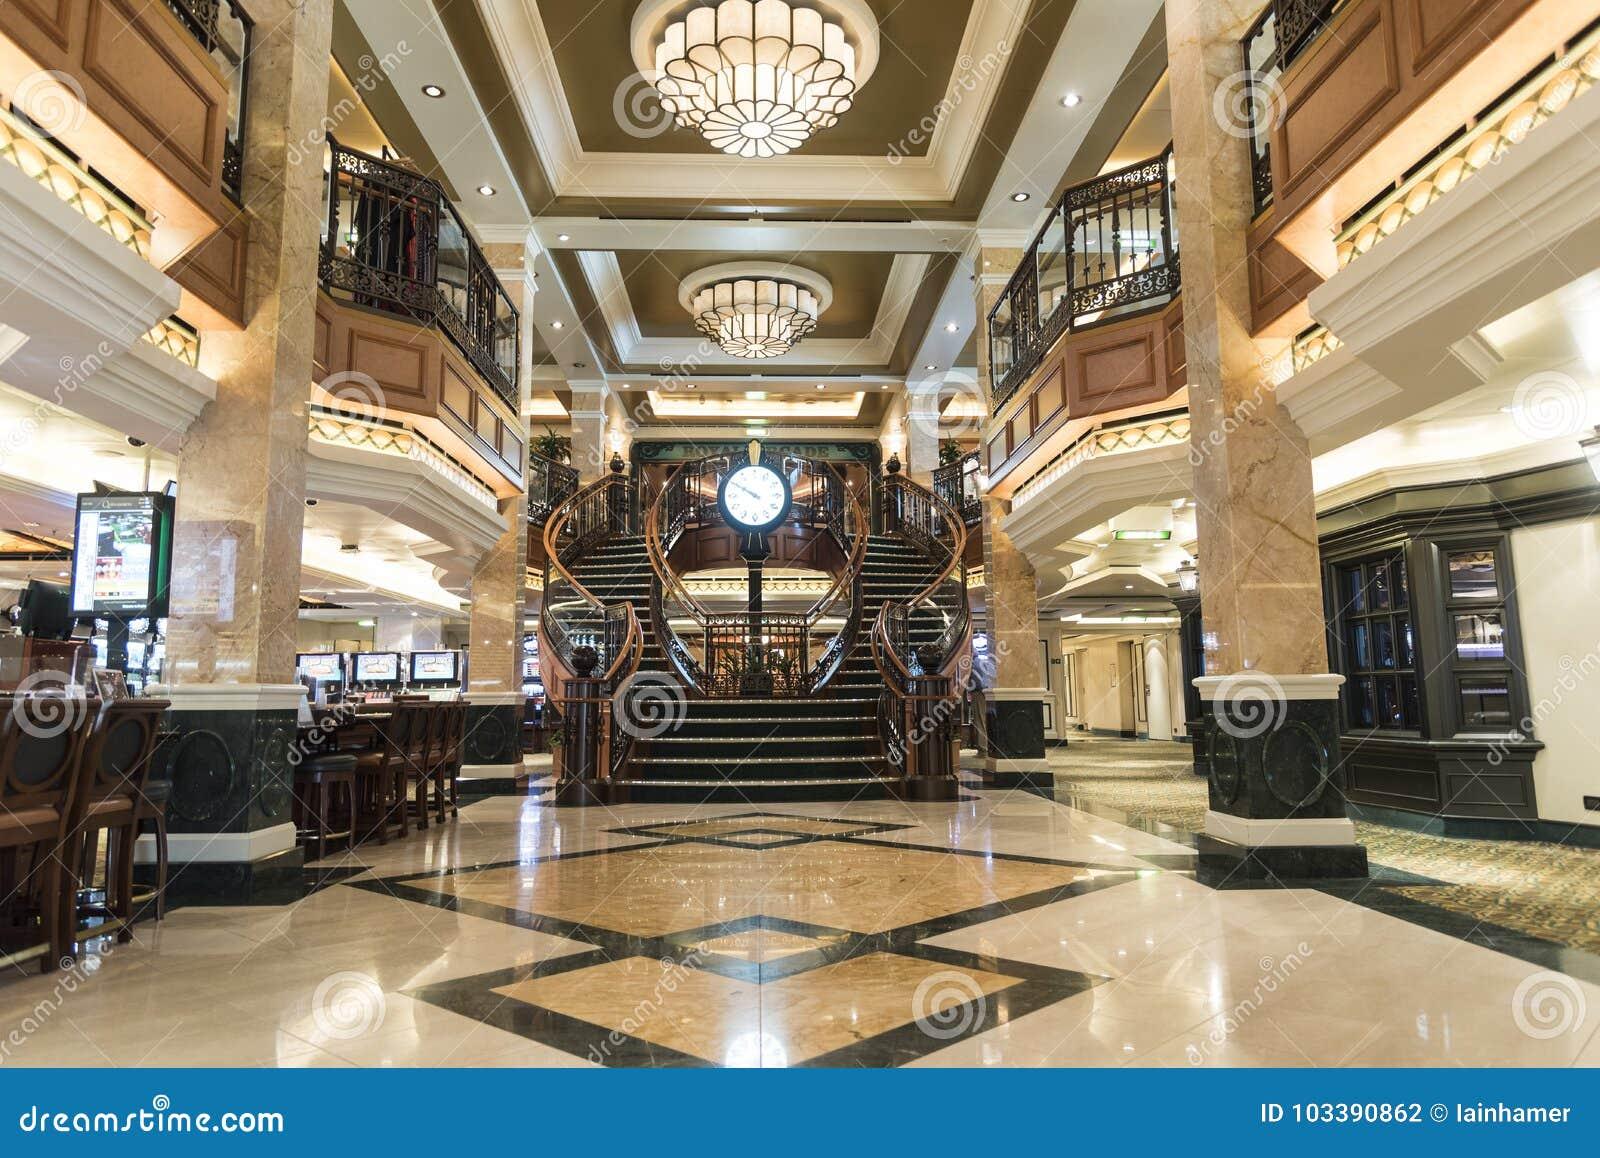 MS Queen Elizabeth Casino Staircase